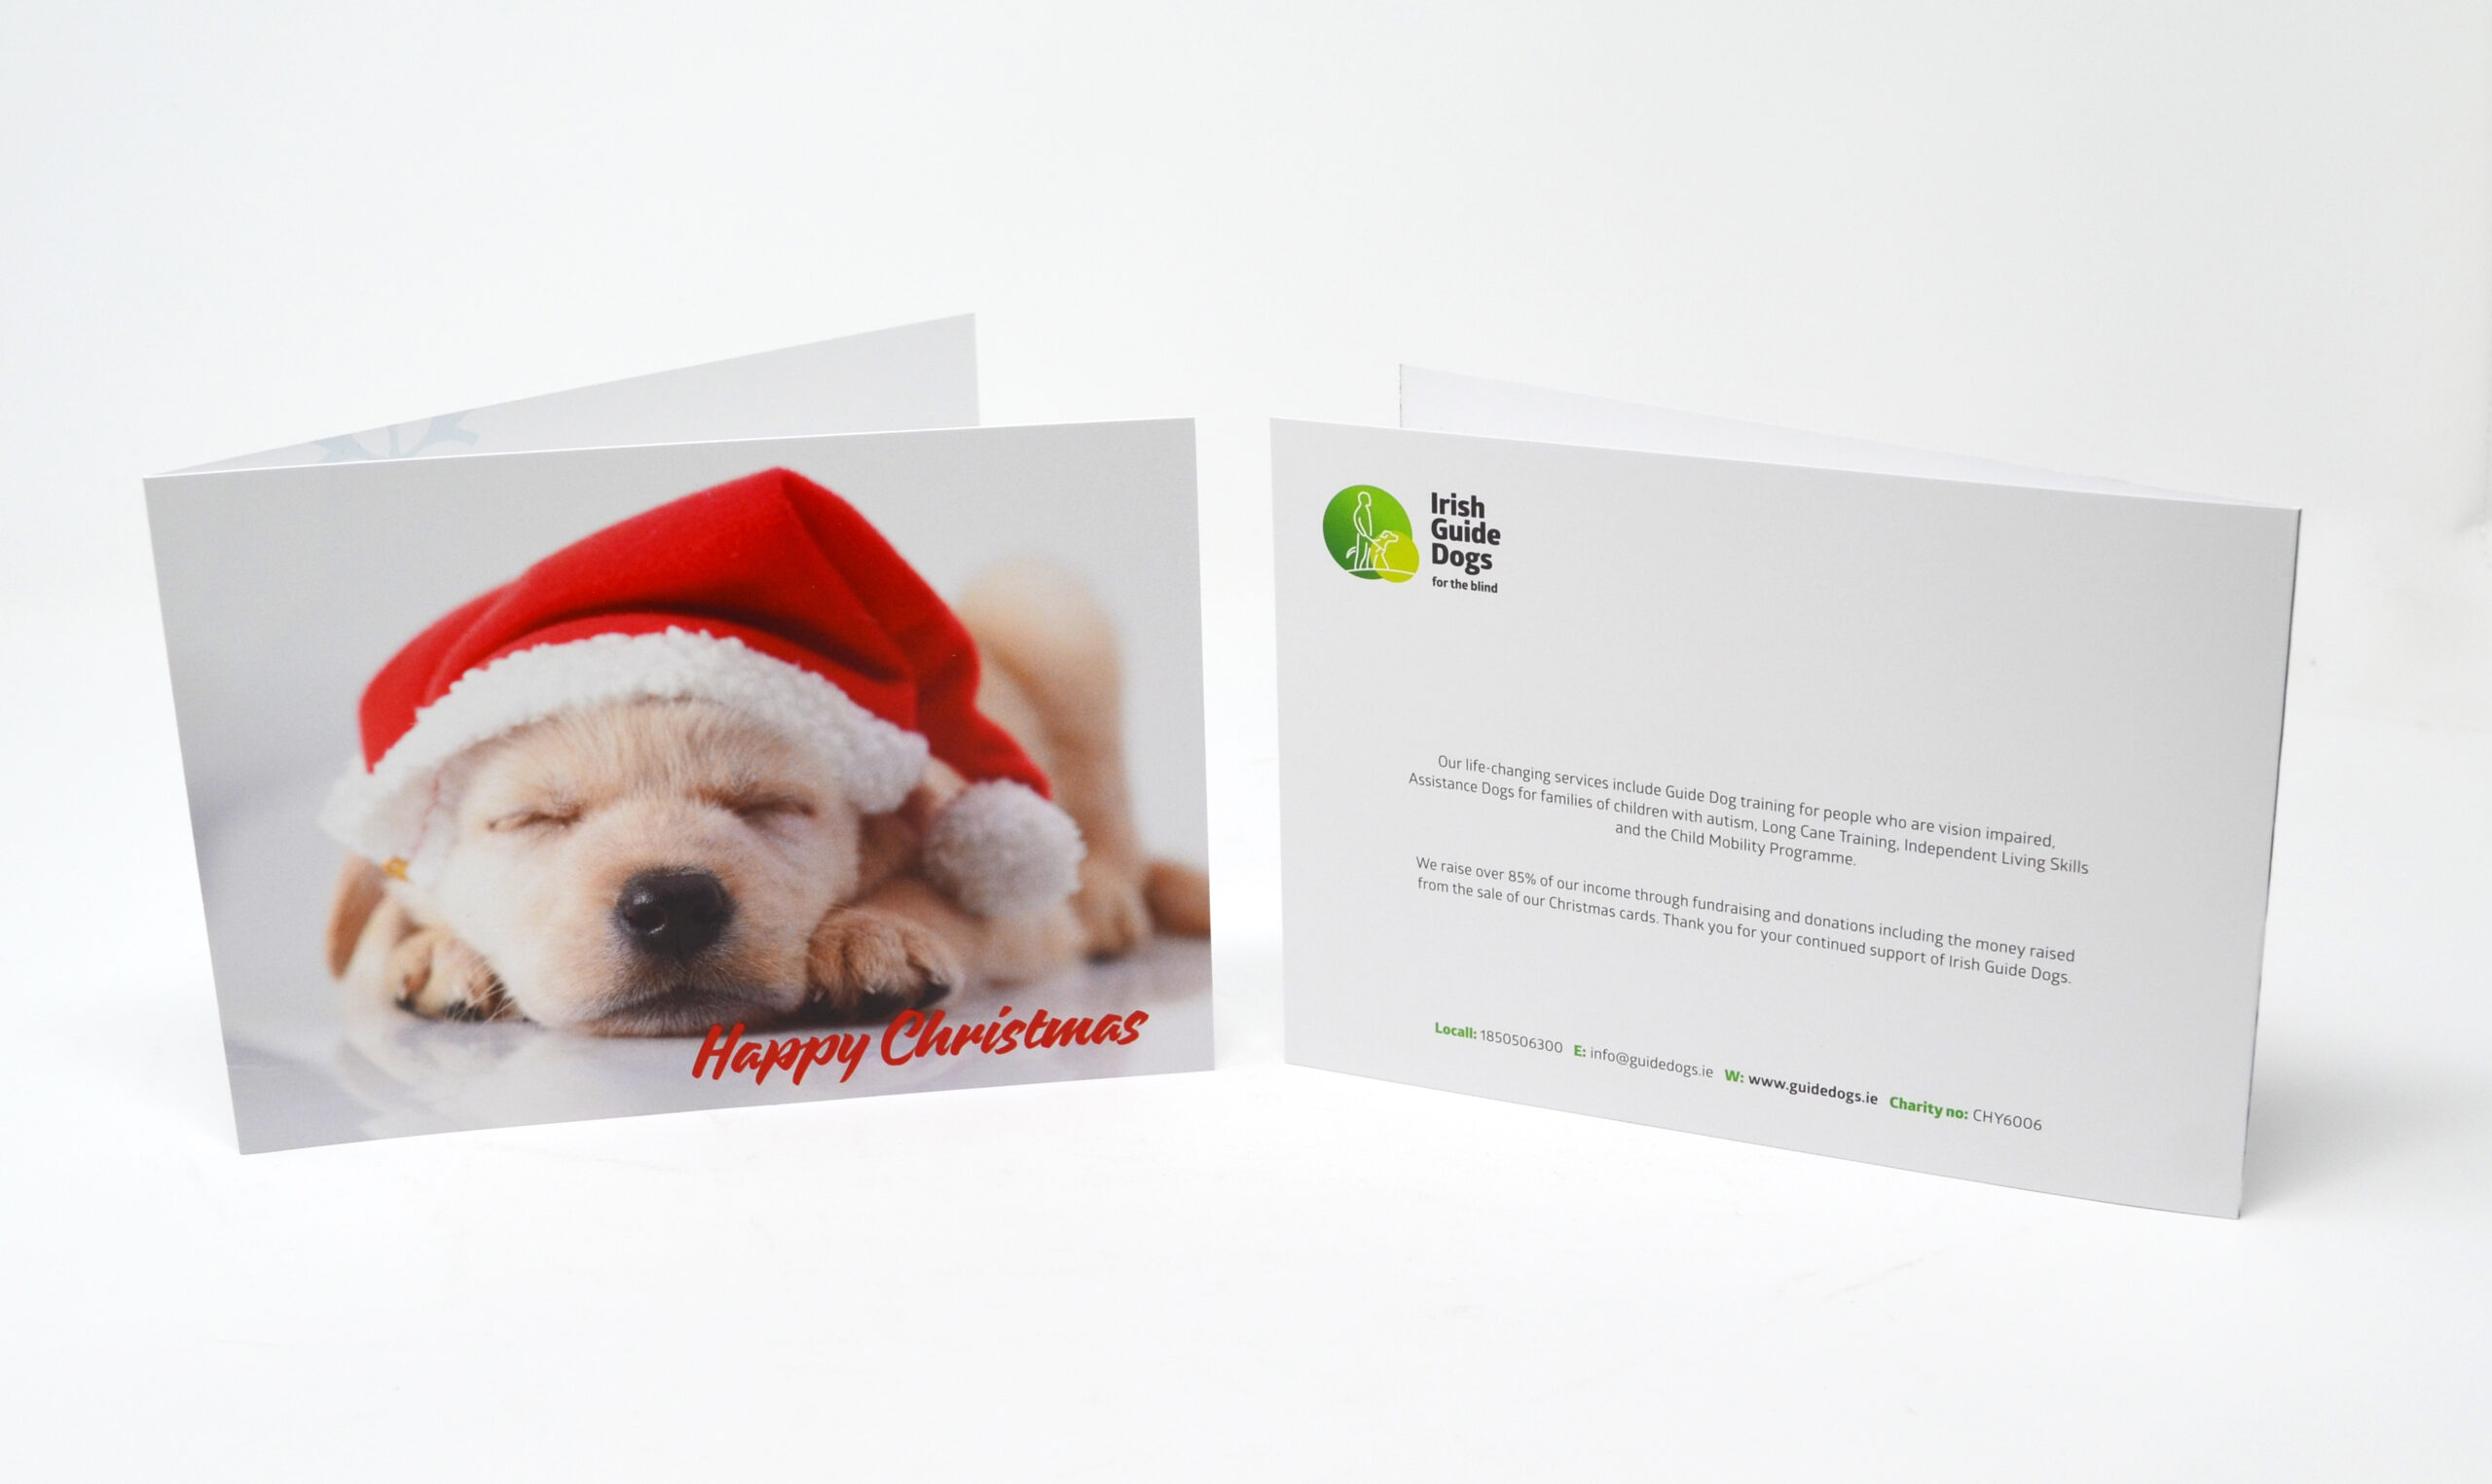 Irish Guide Dogs Christmas Card